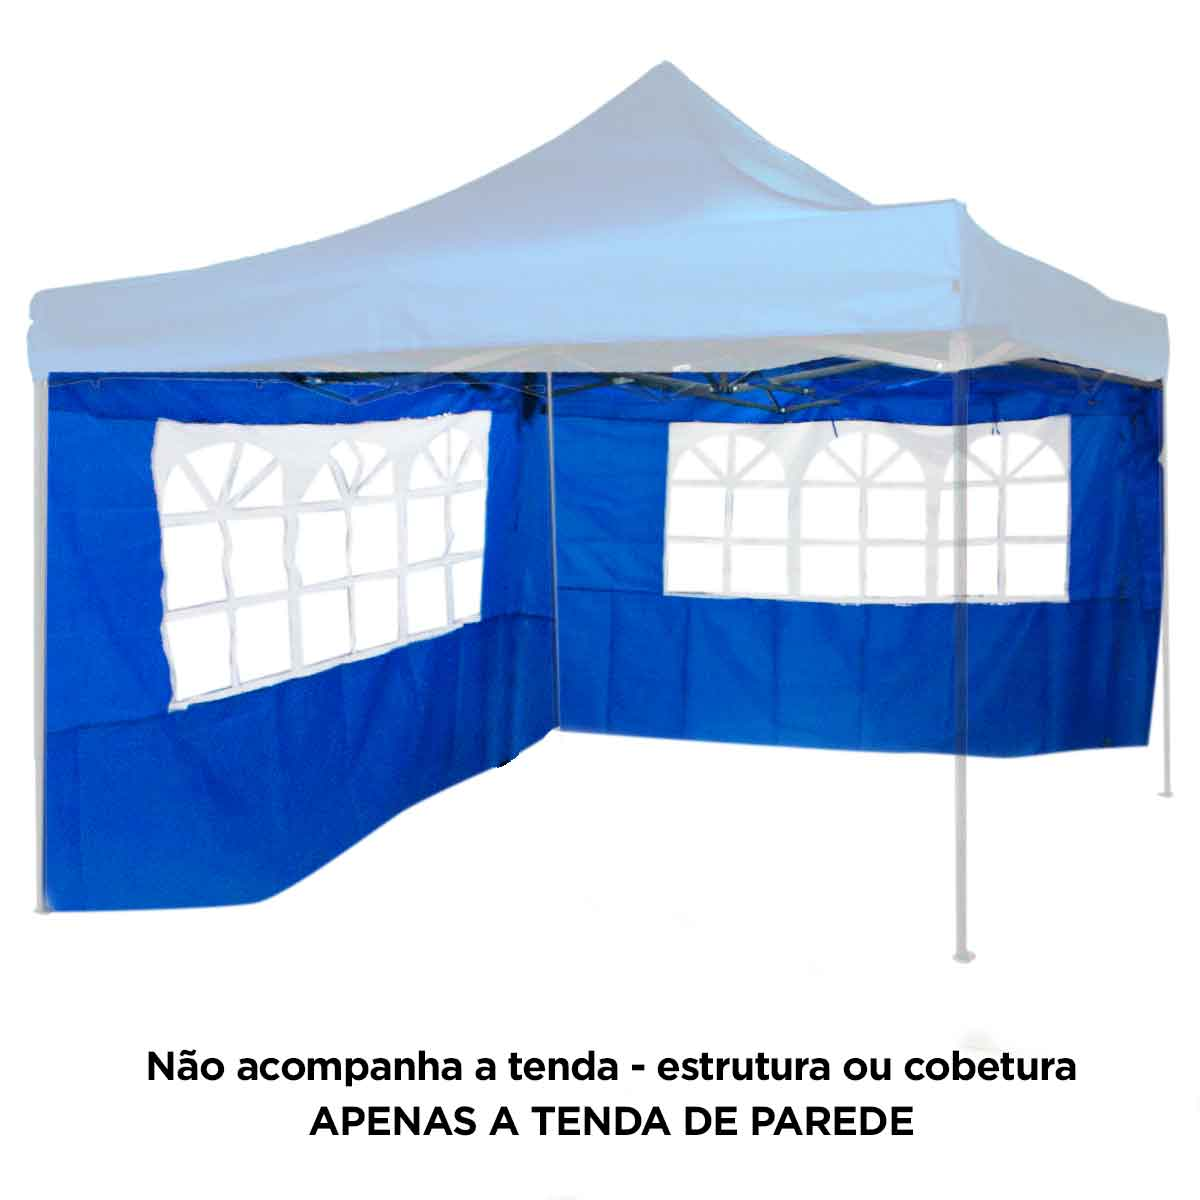 Tenda De Parede Para Gazebo Dobrável Lateral Praia Camping